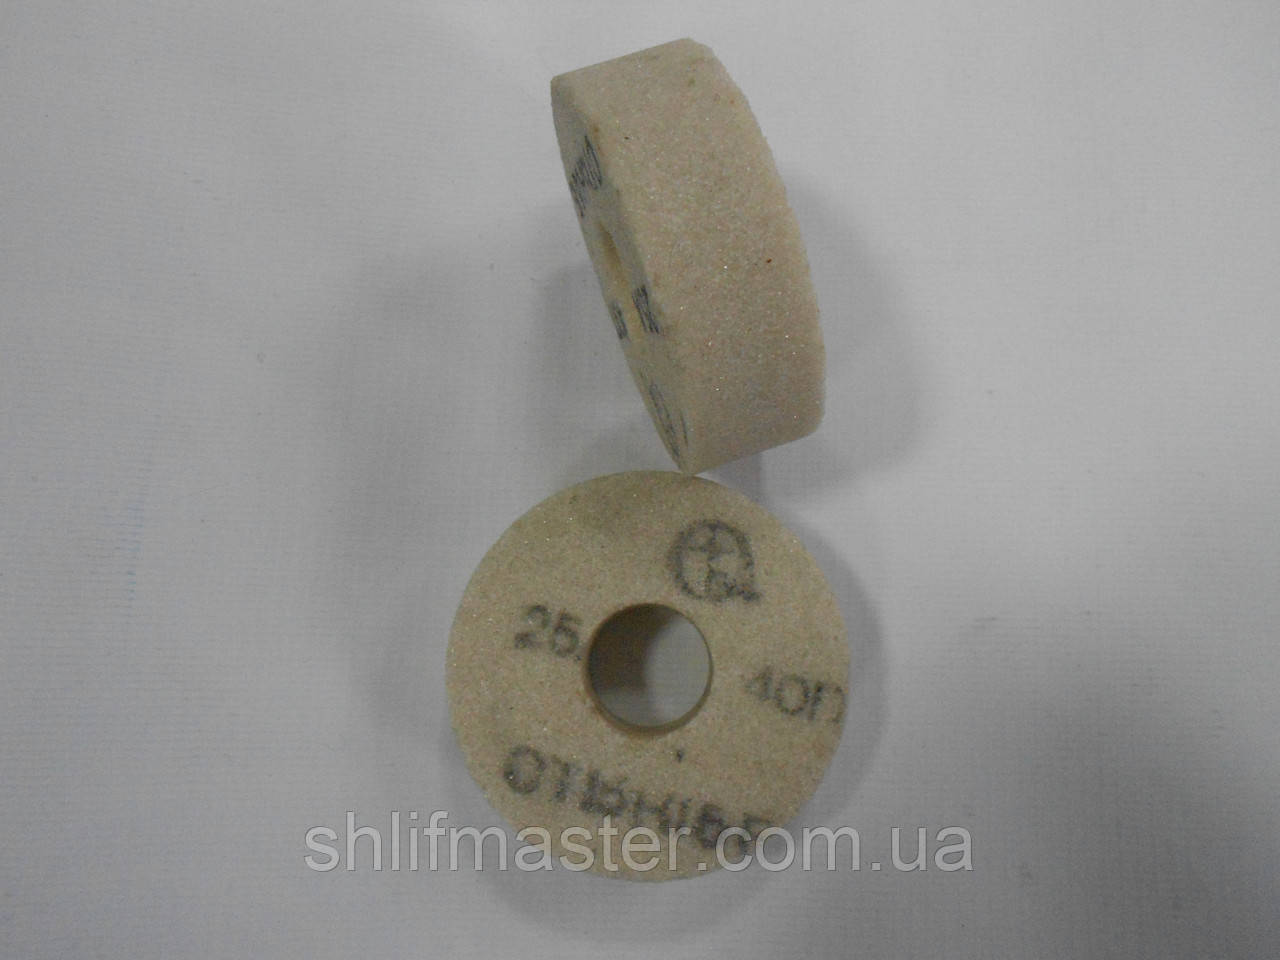 Абразивный круг шлифовальный (электрокорунд белый) 25А ПП 70Х50Х20 25 М-С